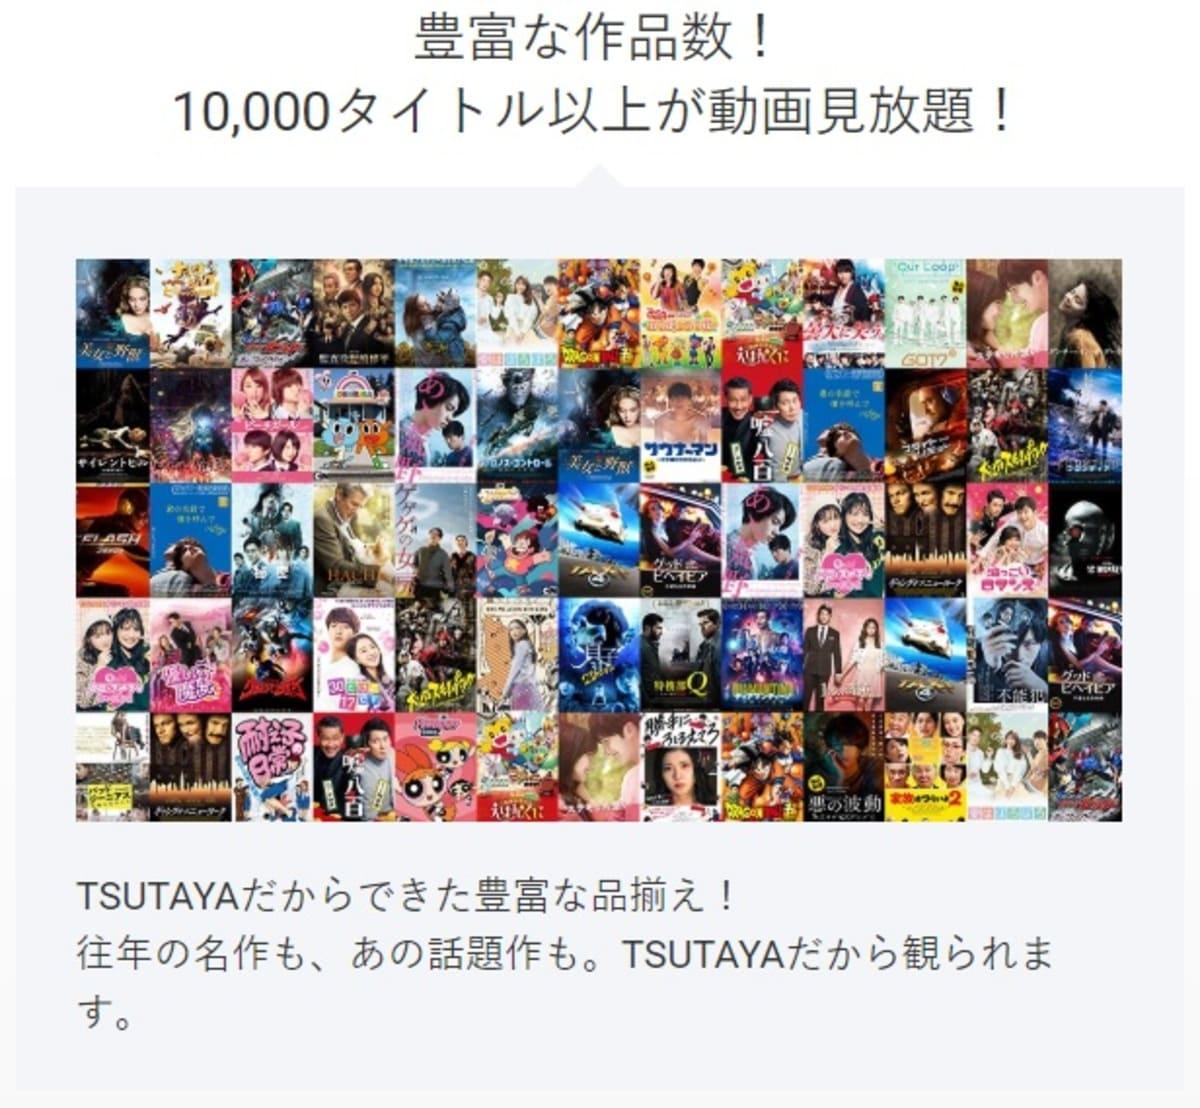 TSUTAYA TVは見放題作品が1万3千作品!動画ポイントでネット上レンタルも可能!